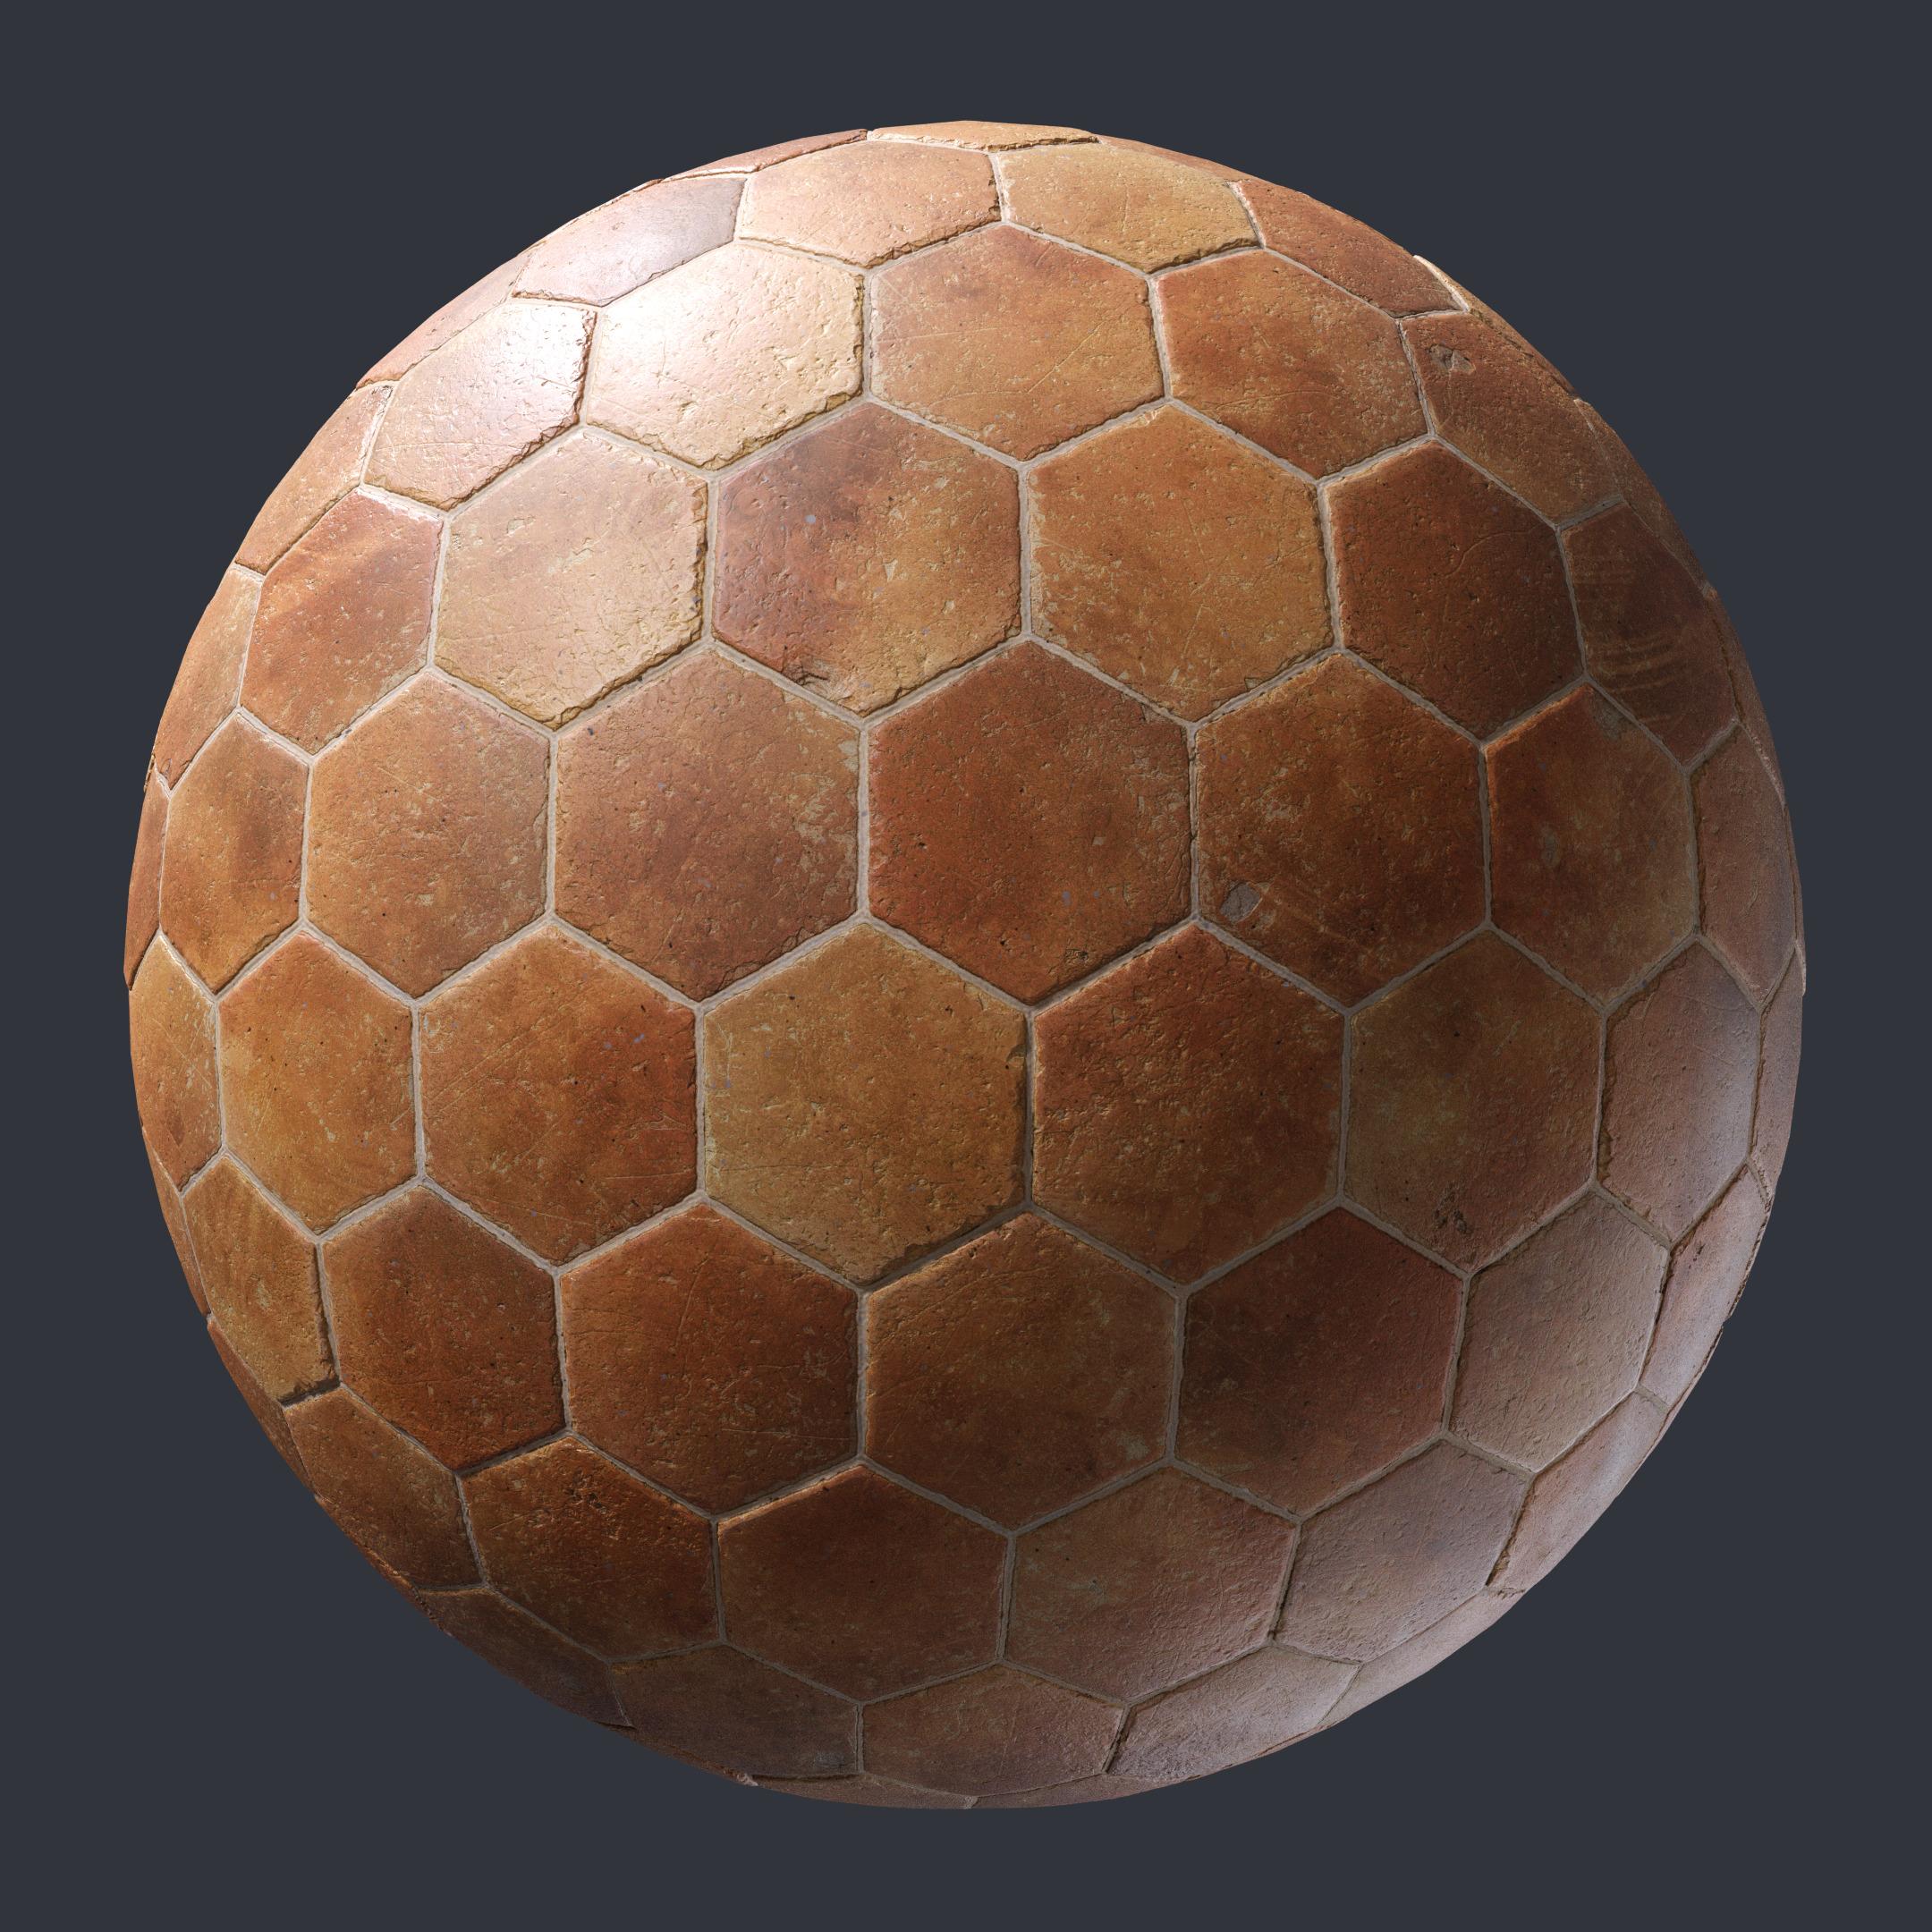 Hexagonal Terracotta Floor Tiles - PBR00191